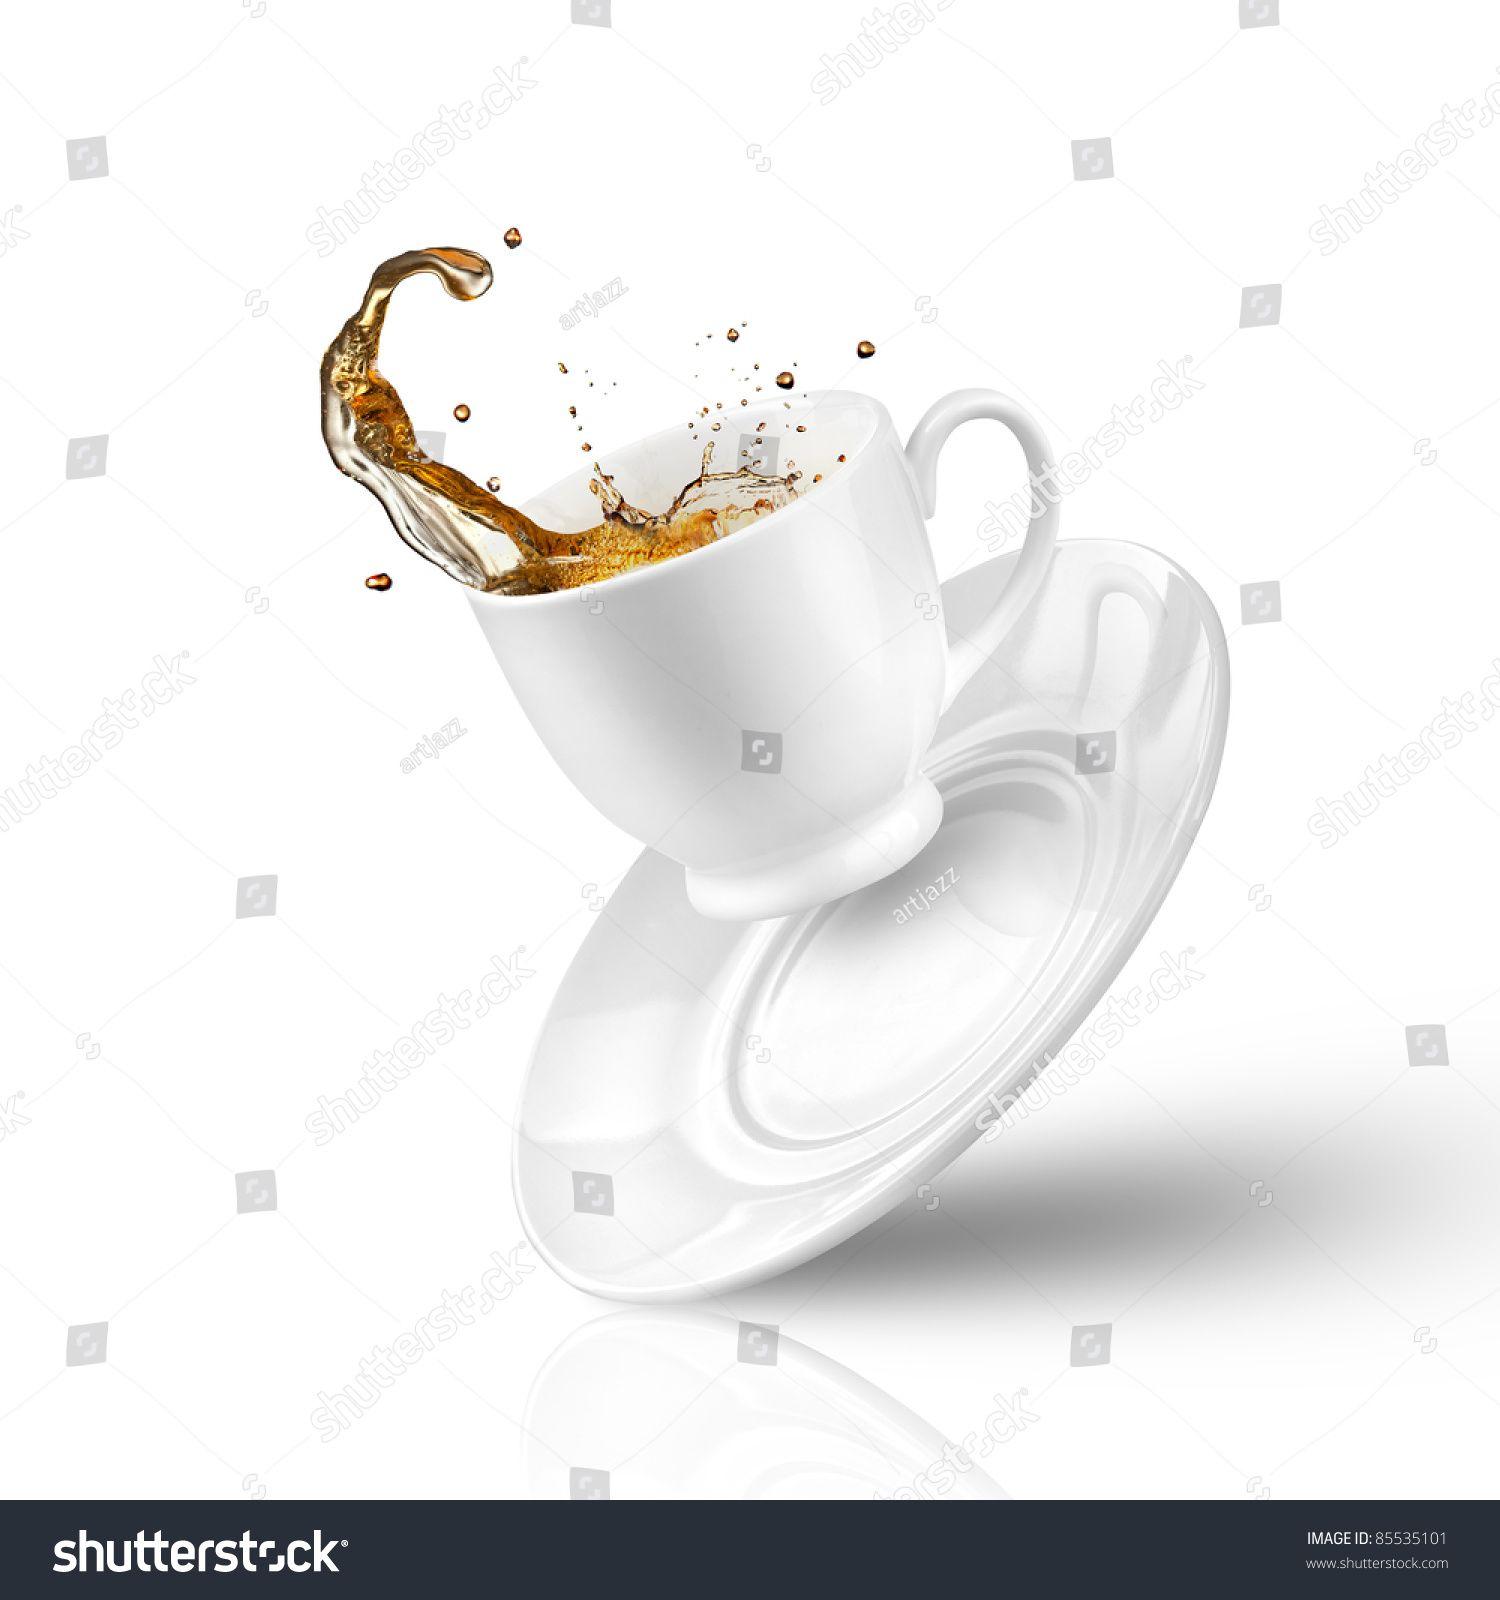 Splash Of Tea In The Falling Cup Isolated On White Ad Ad Falling Tea Splash White In 2020 Tea Cups Tea Cup Hd wallpaper milk splash cookies mug